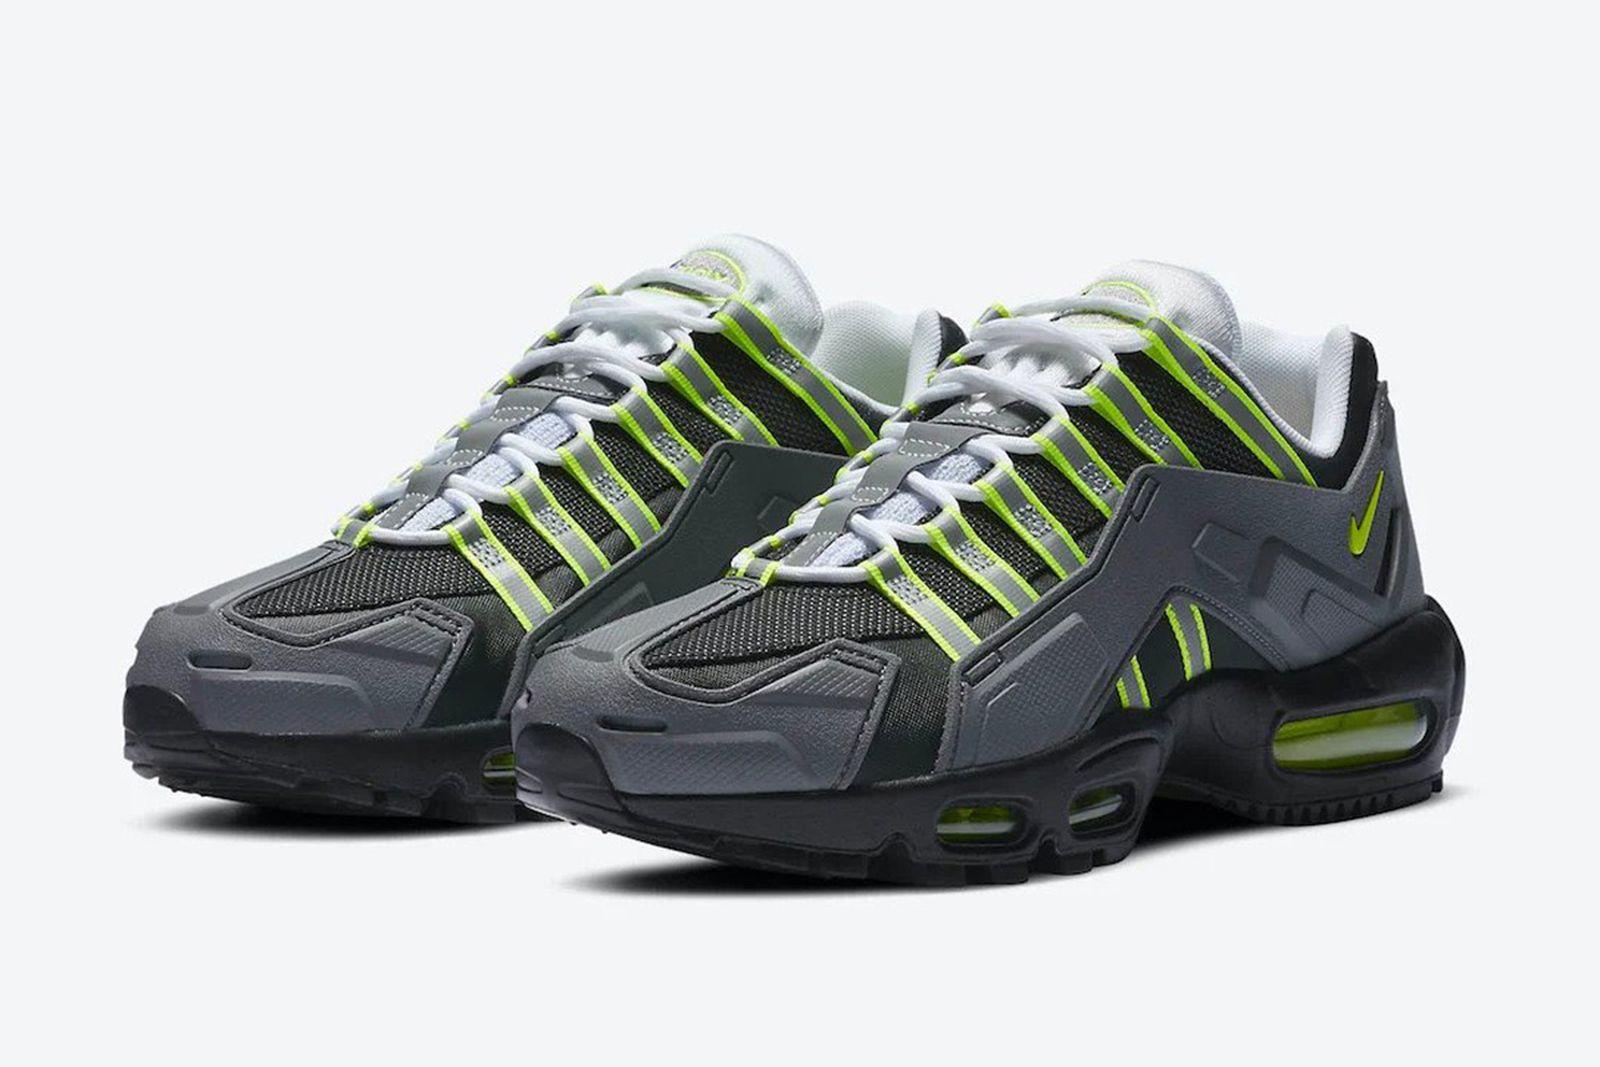 nike-air-max-95-ndstrkt-neon-release-date-price-01